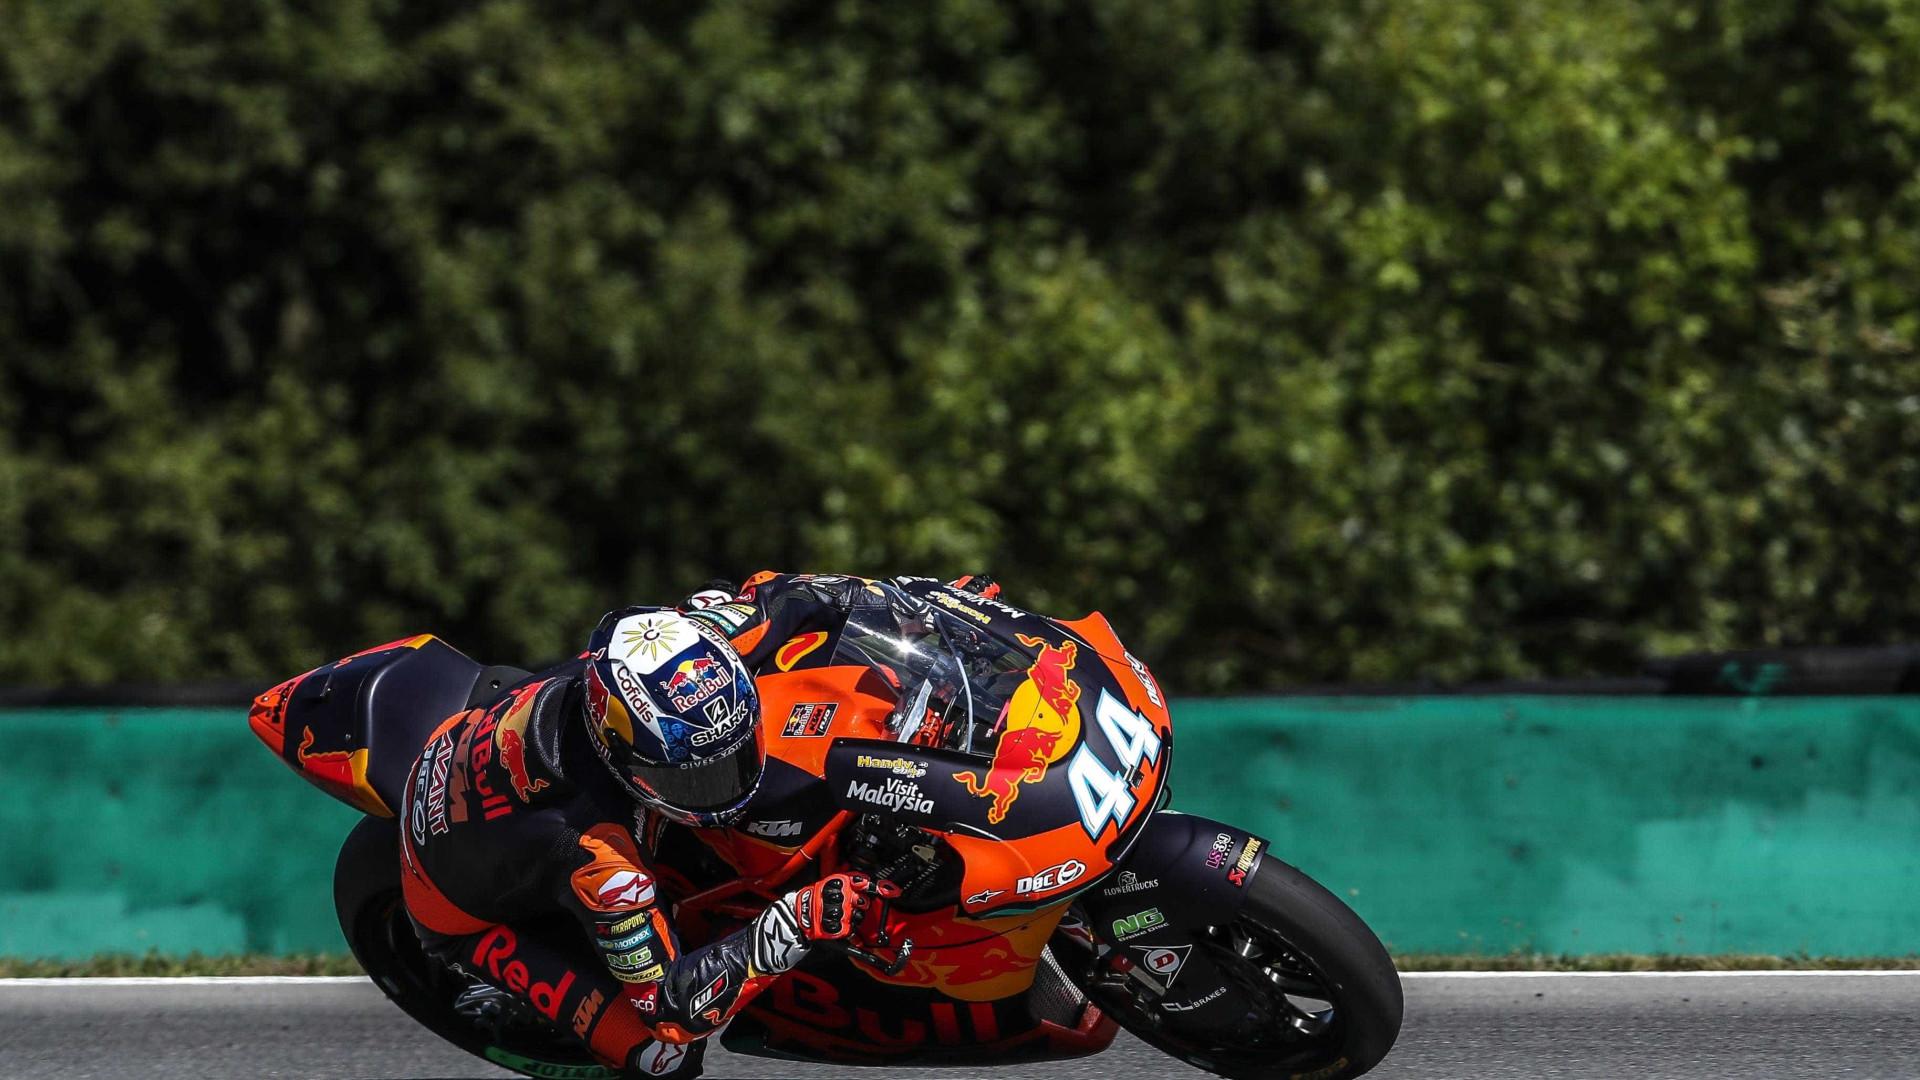 Miguel Oliveira despista-se e abandona GP da Áustria, Morbidelli vence